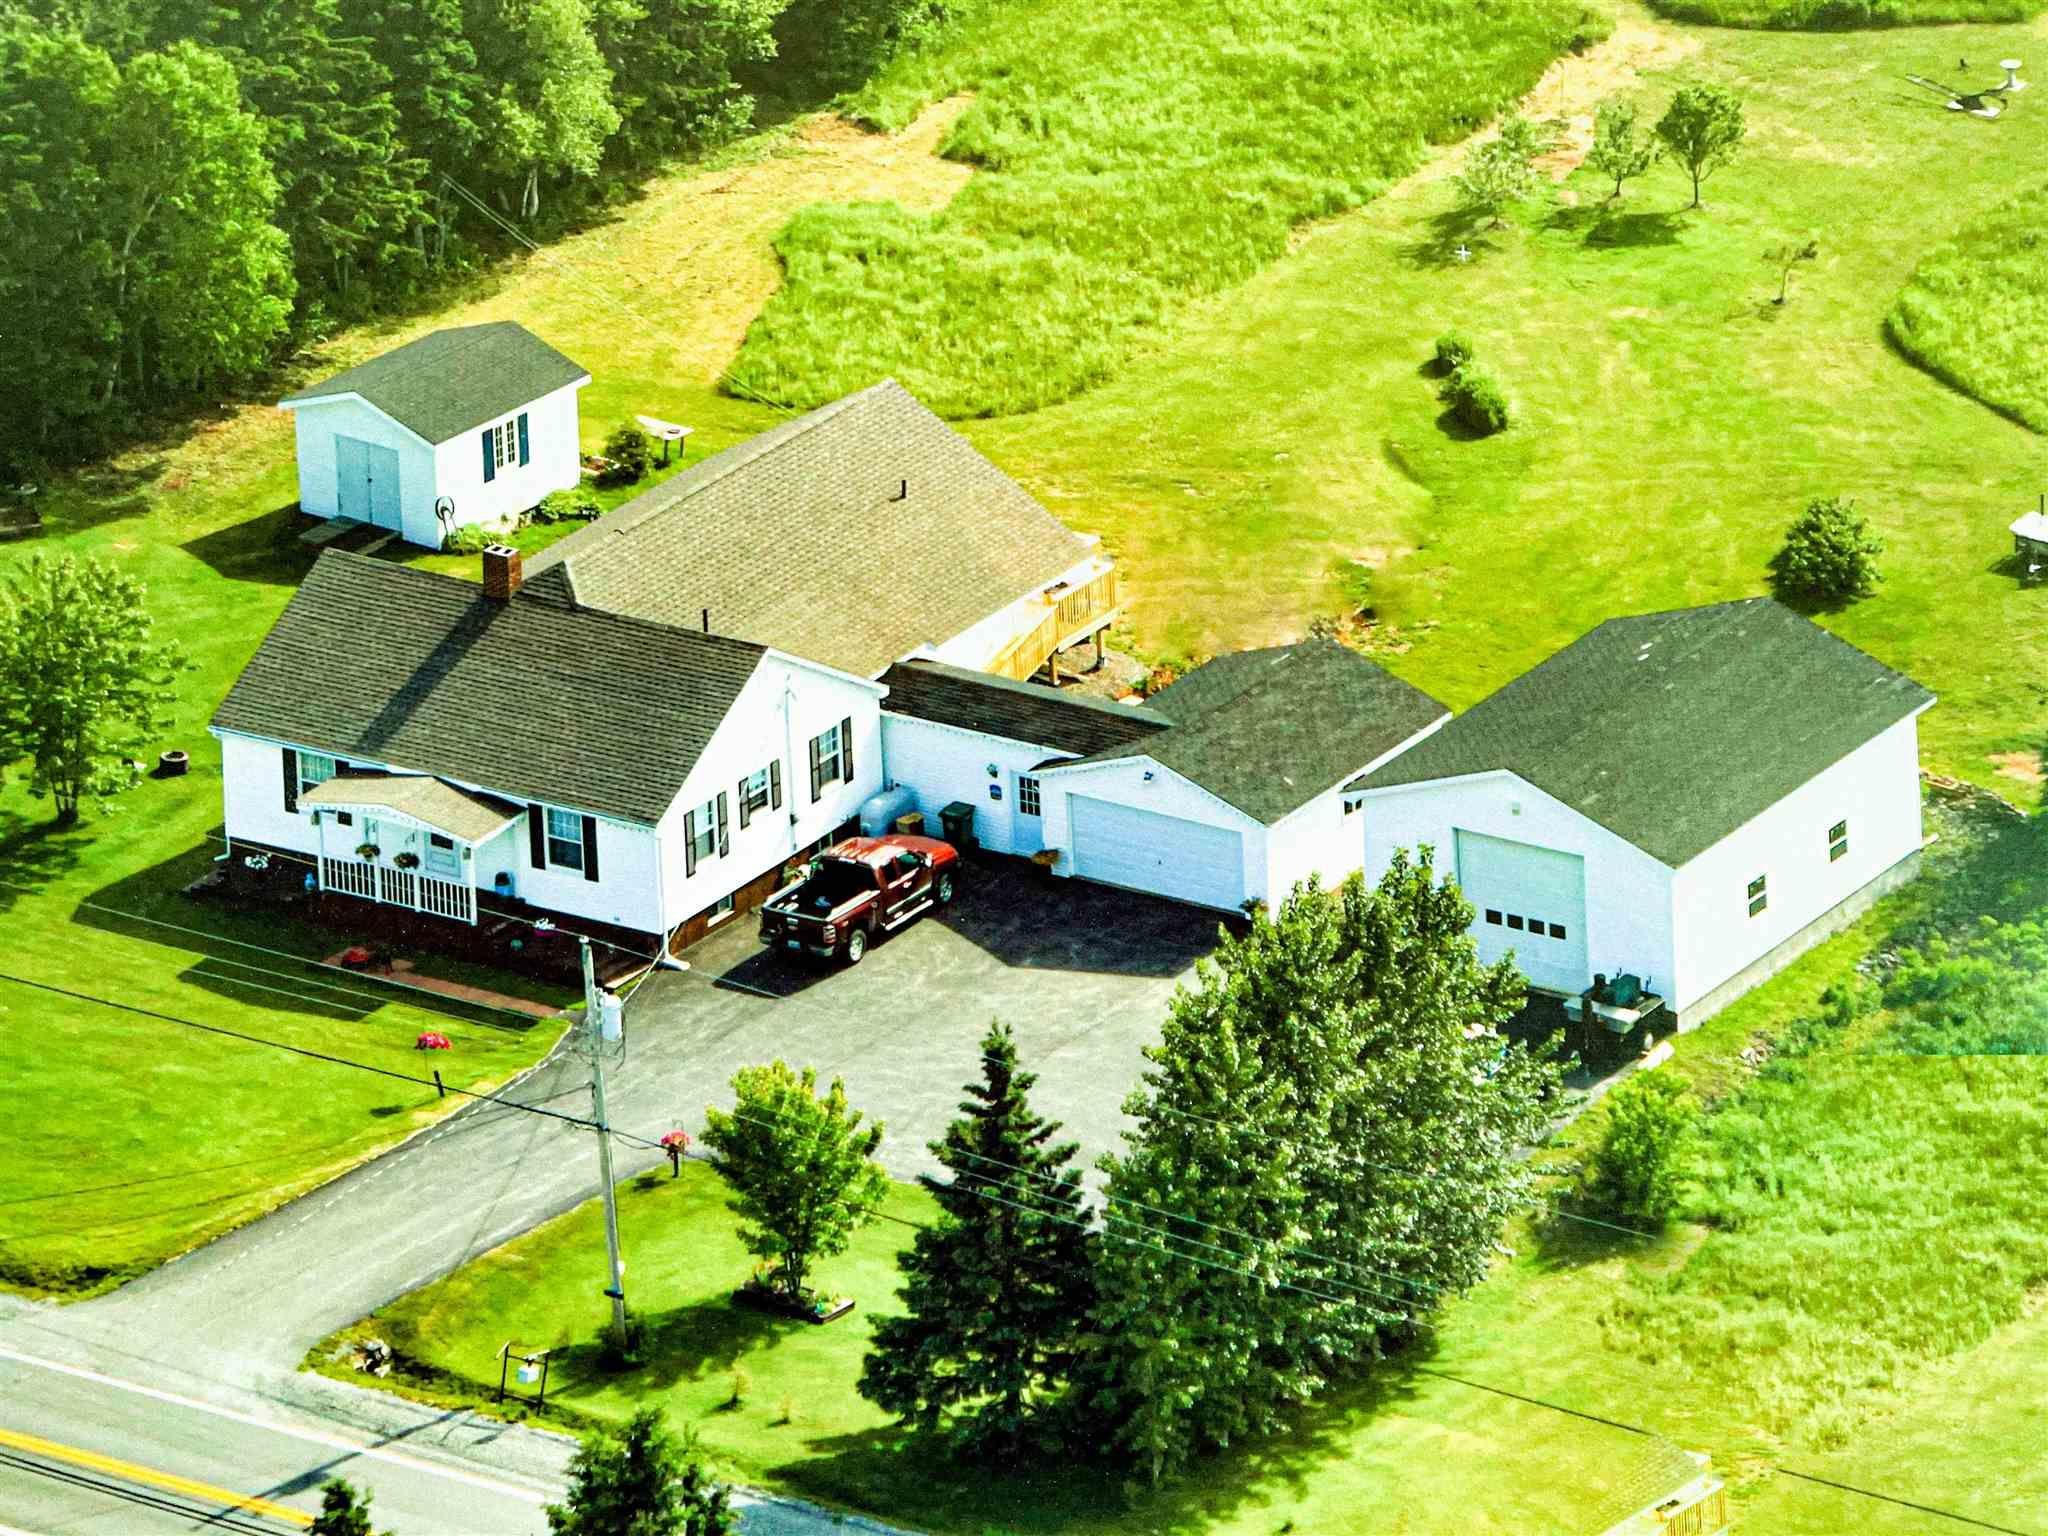 Main Photo: 18413 Highway 2 in Fenwick: 101-Amherst,Brookdale,Warren Residential for sale (Northern Region)  : MLS®# 202111145